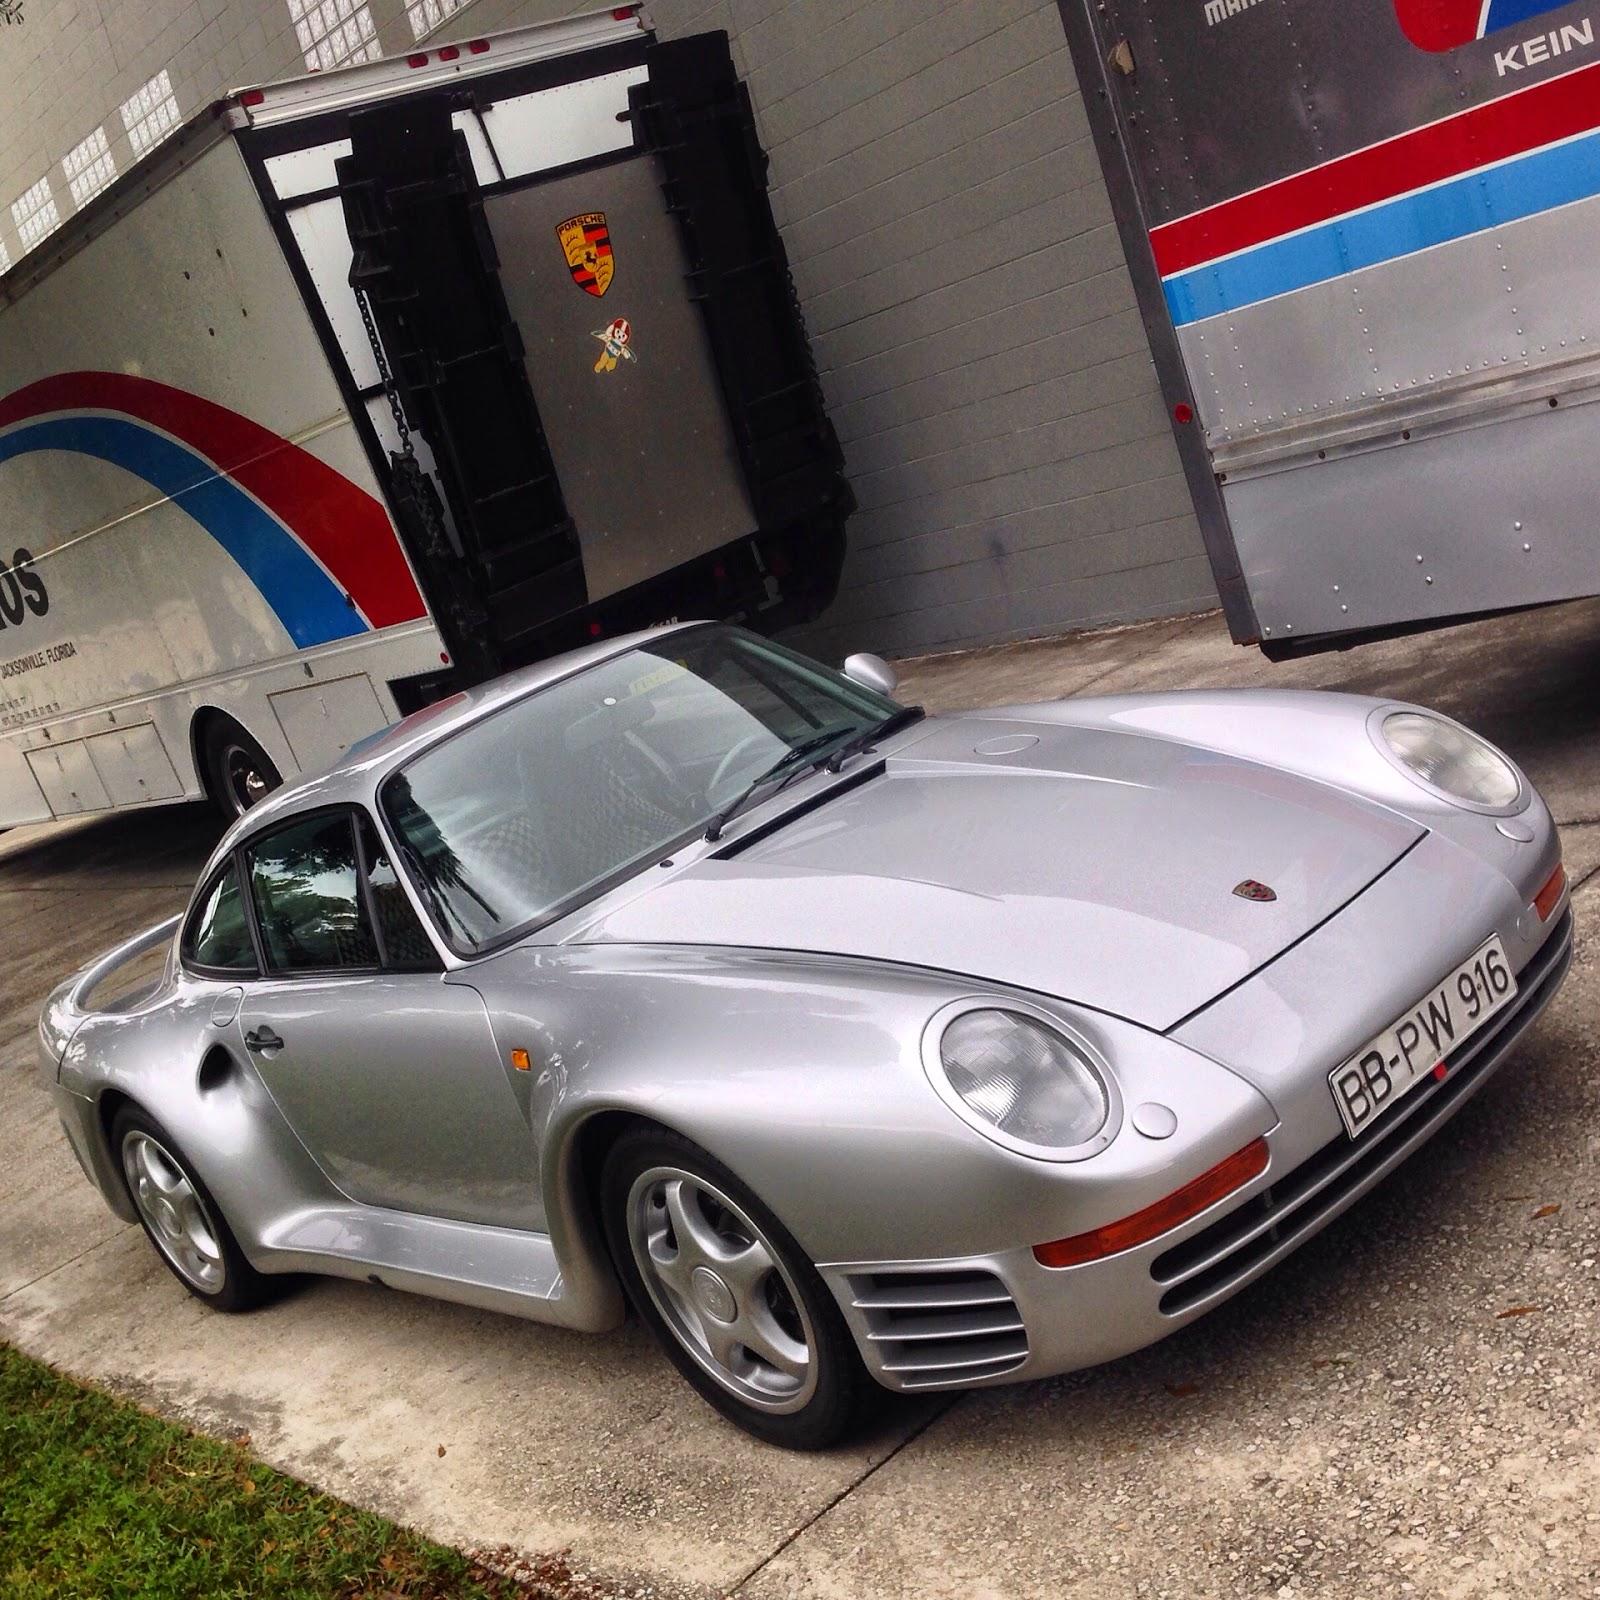 MagnusWalker911: Ponte Vedre Auto Show 2014